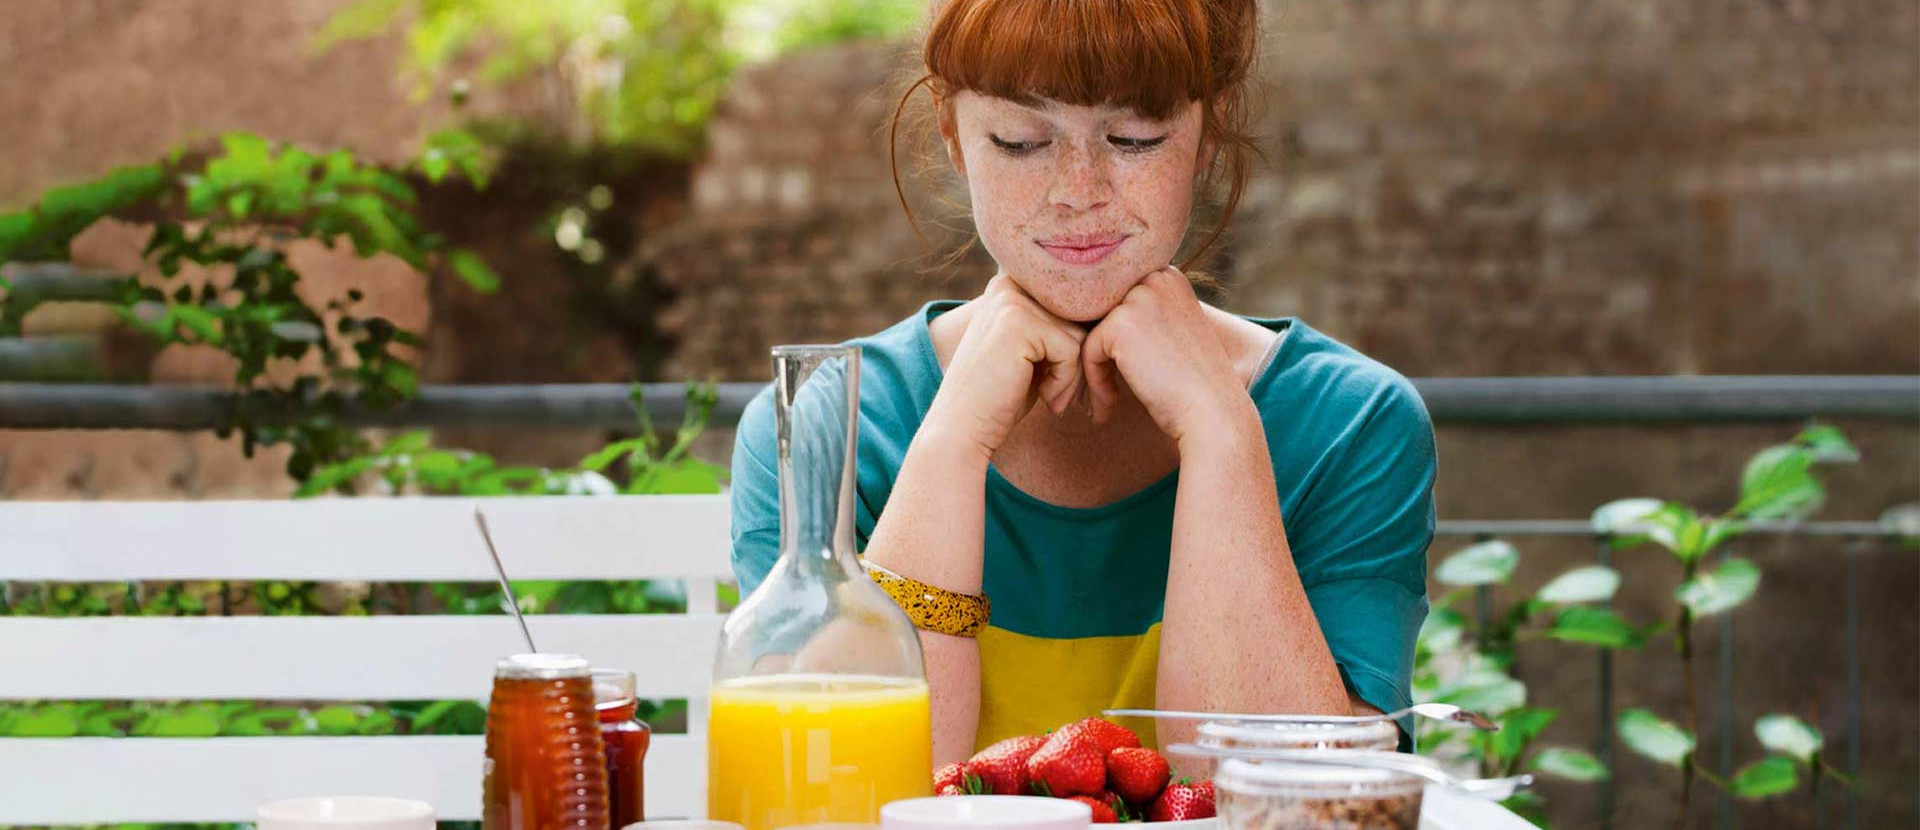 Frau schaut auf Lebensmittel